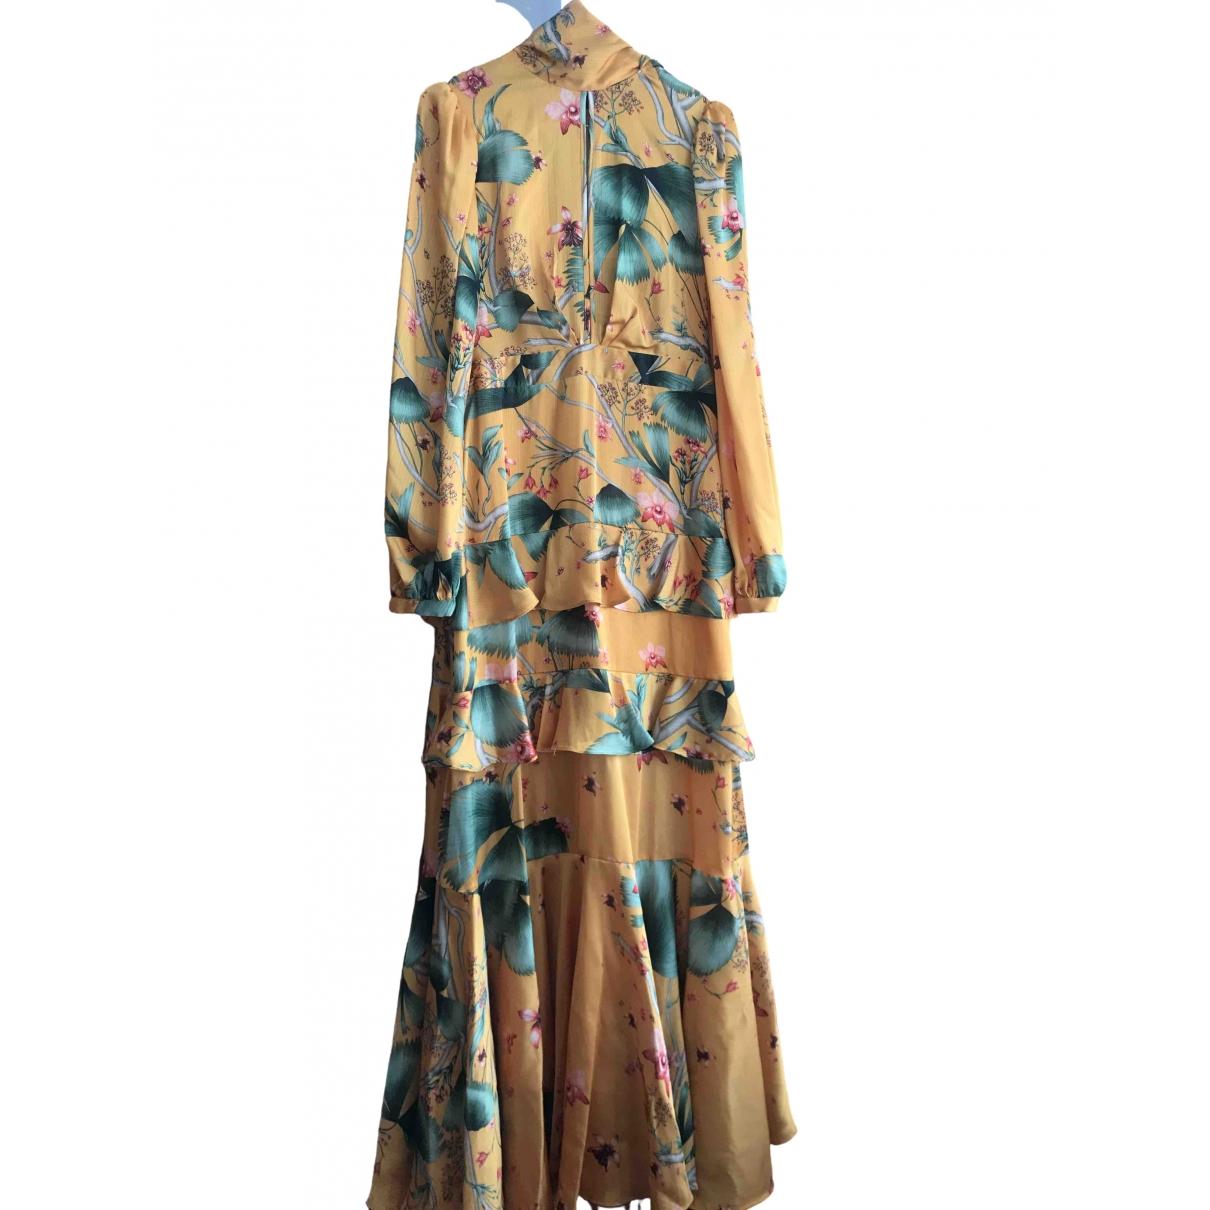 Johanna Ortiz X H&m \N Kleid in  Gelb Polyester